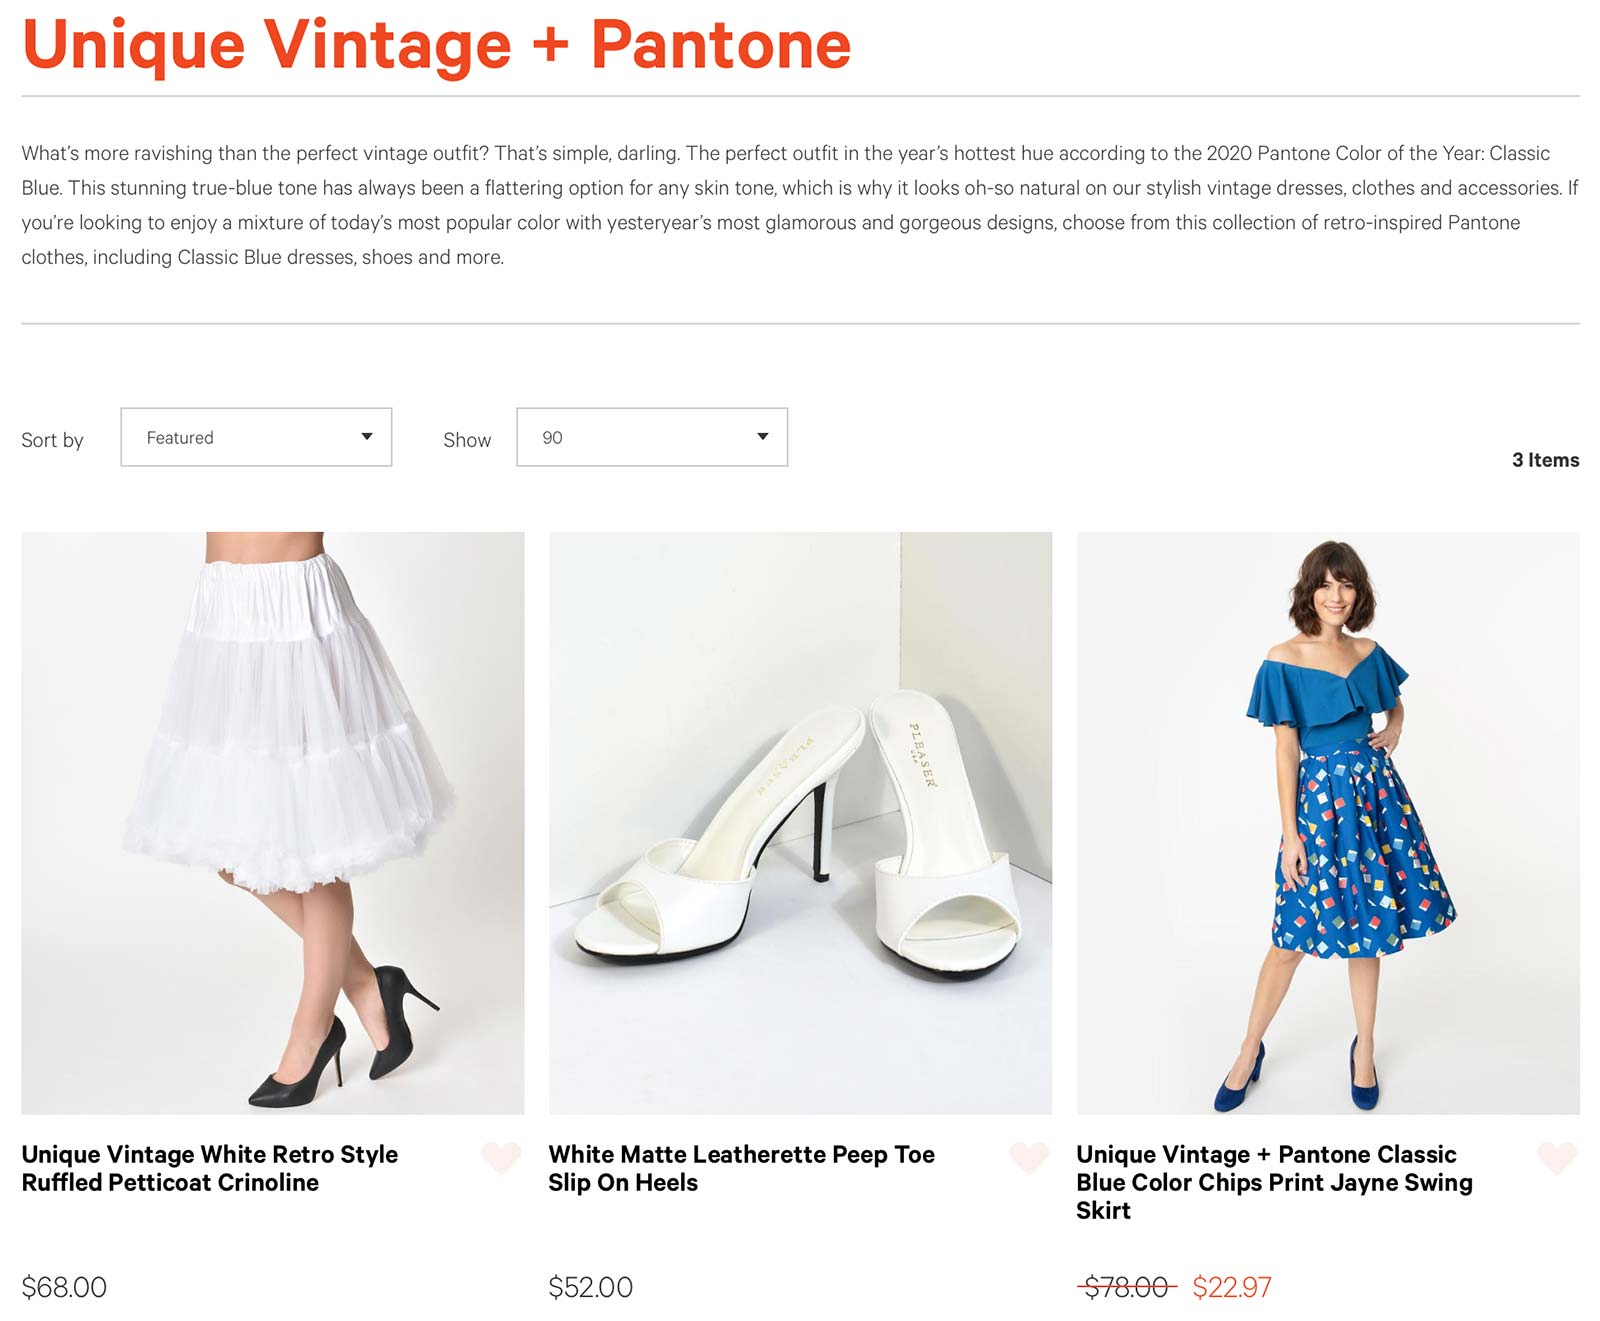 Unique Vintage store's showcase of Pantone-inspired apparel